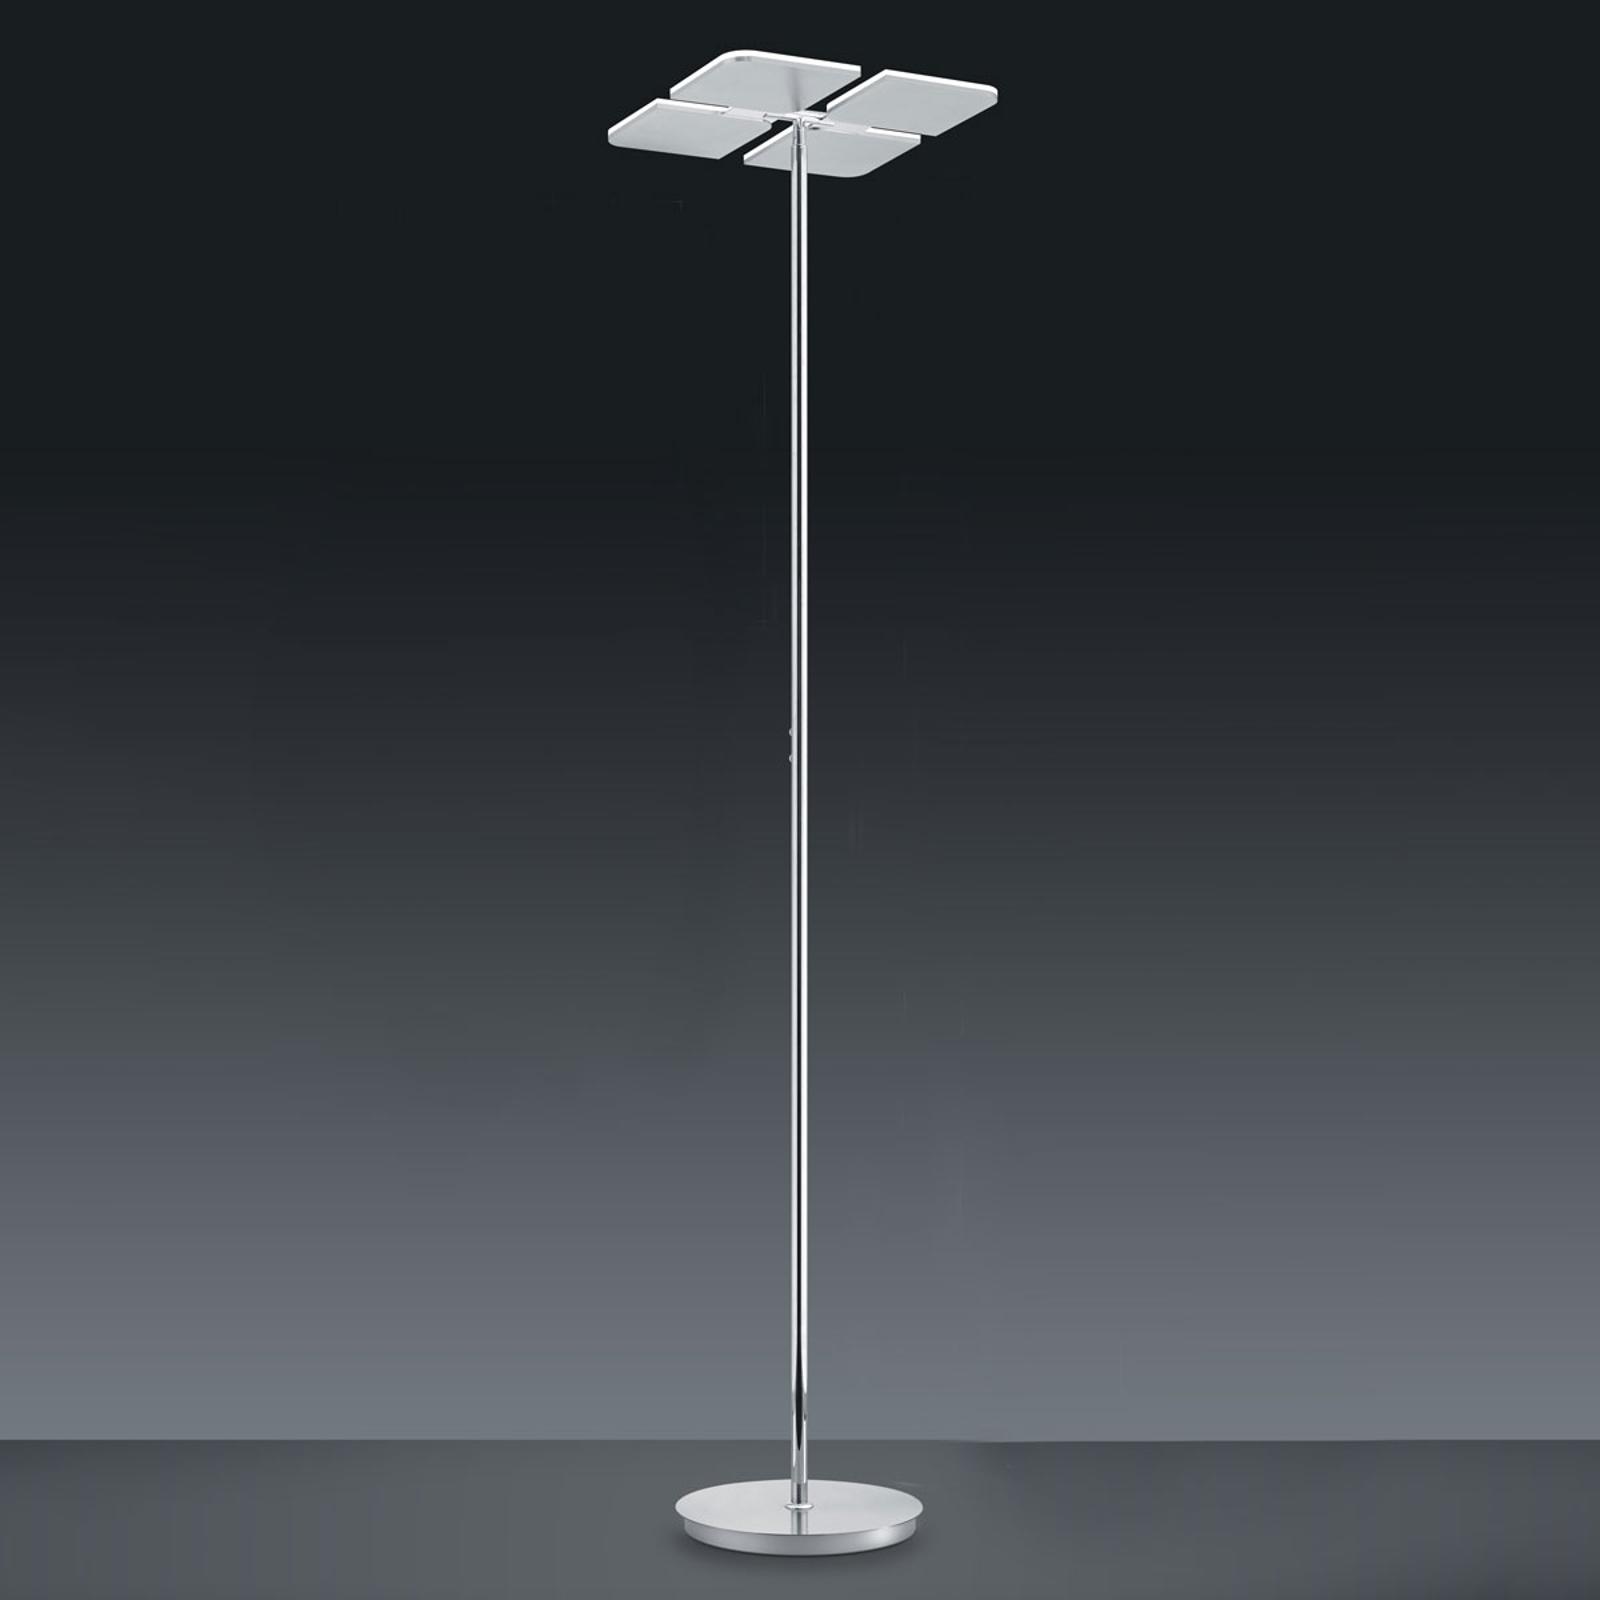 BANKAMP Quadrifoglio LED vloerlamp, 2.700-6.500K